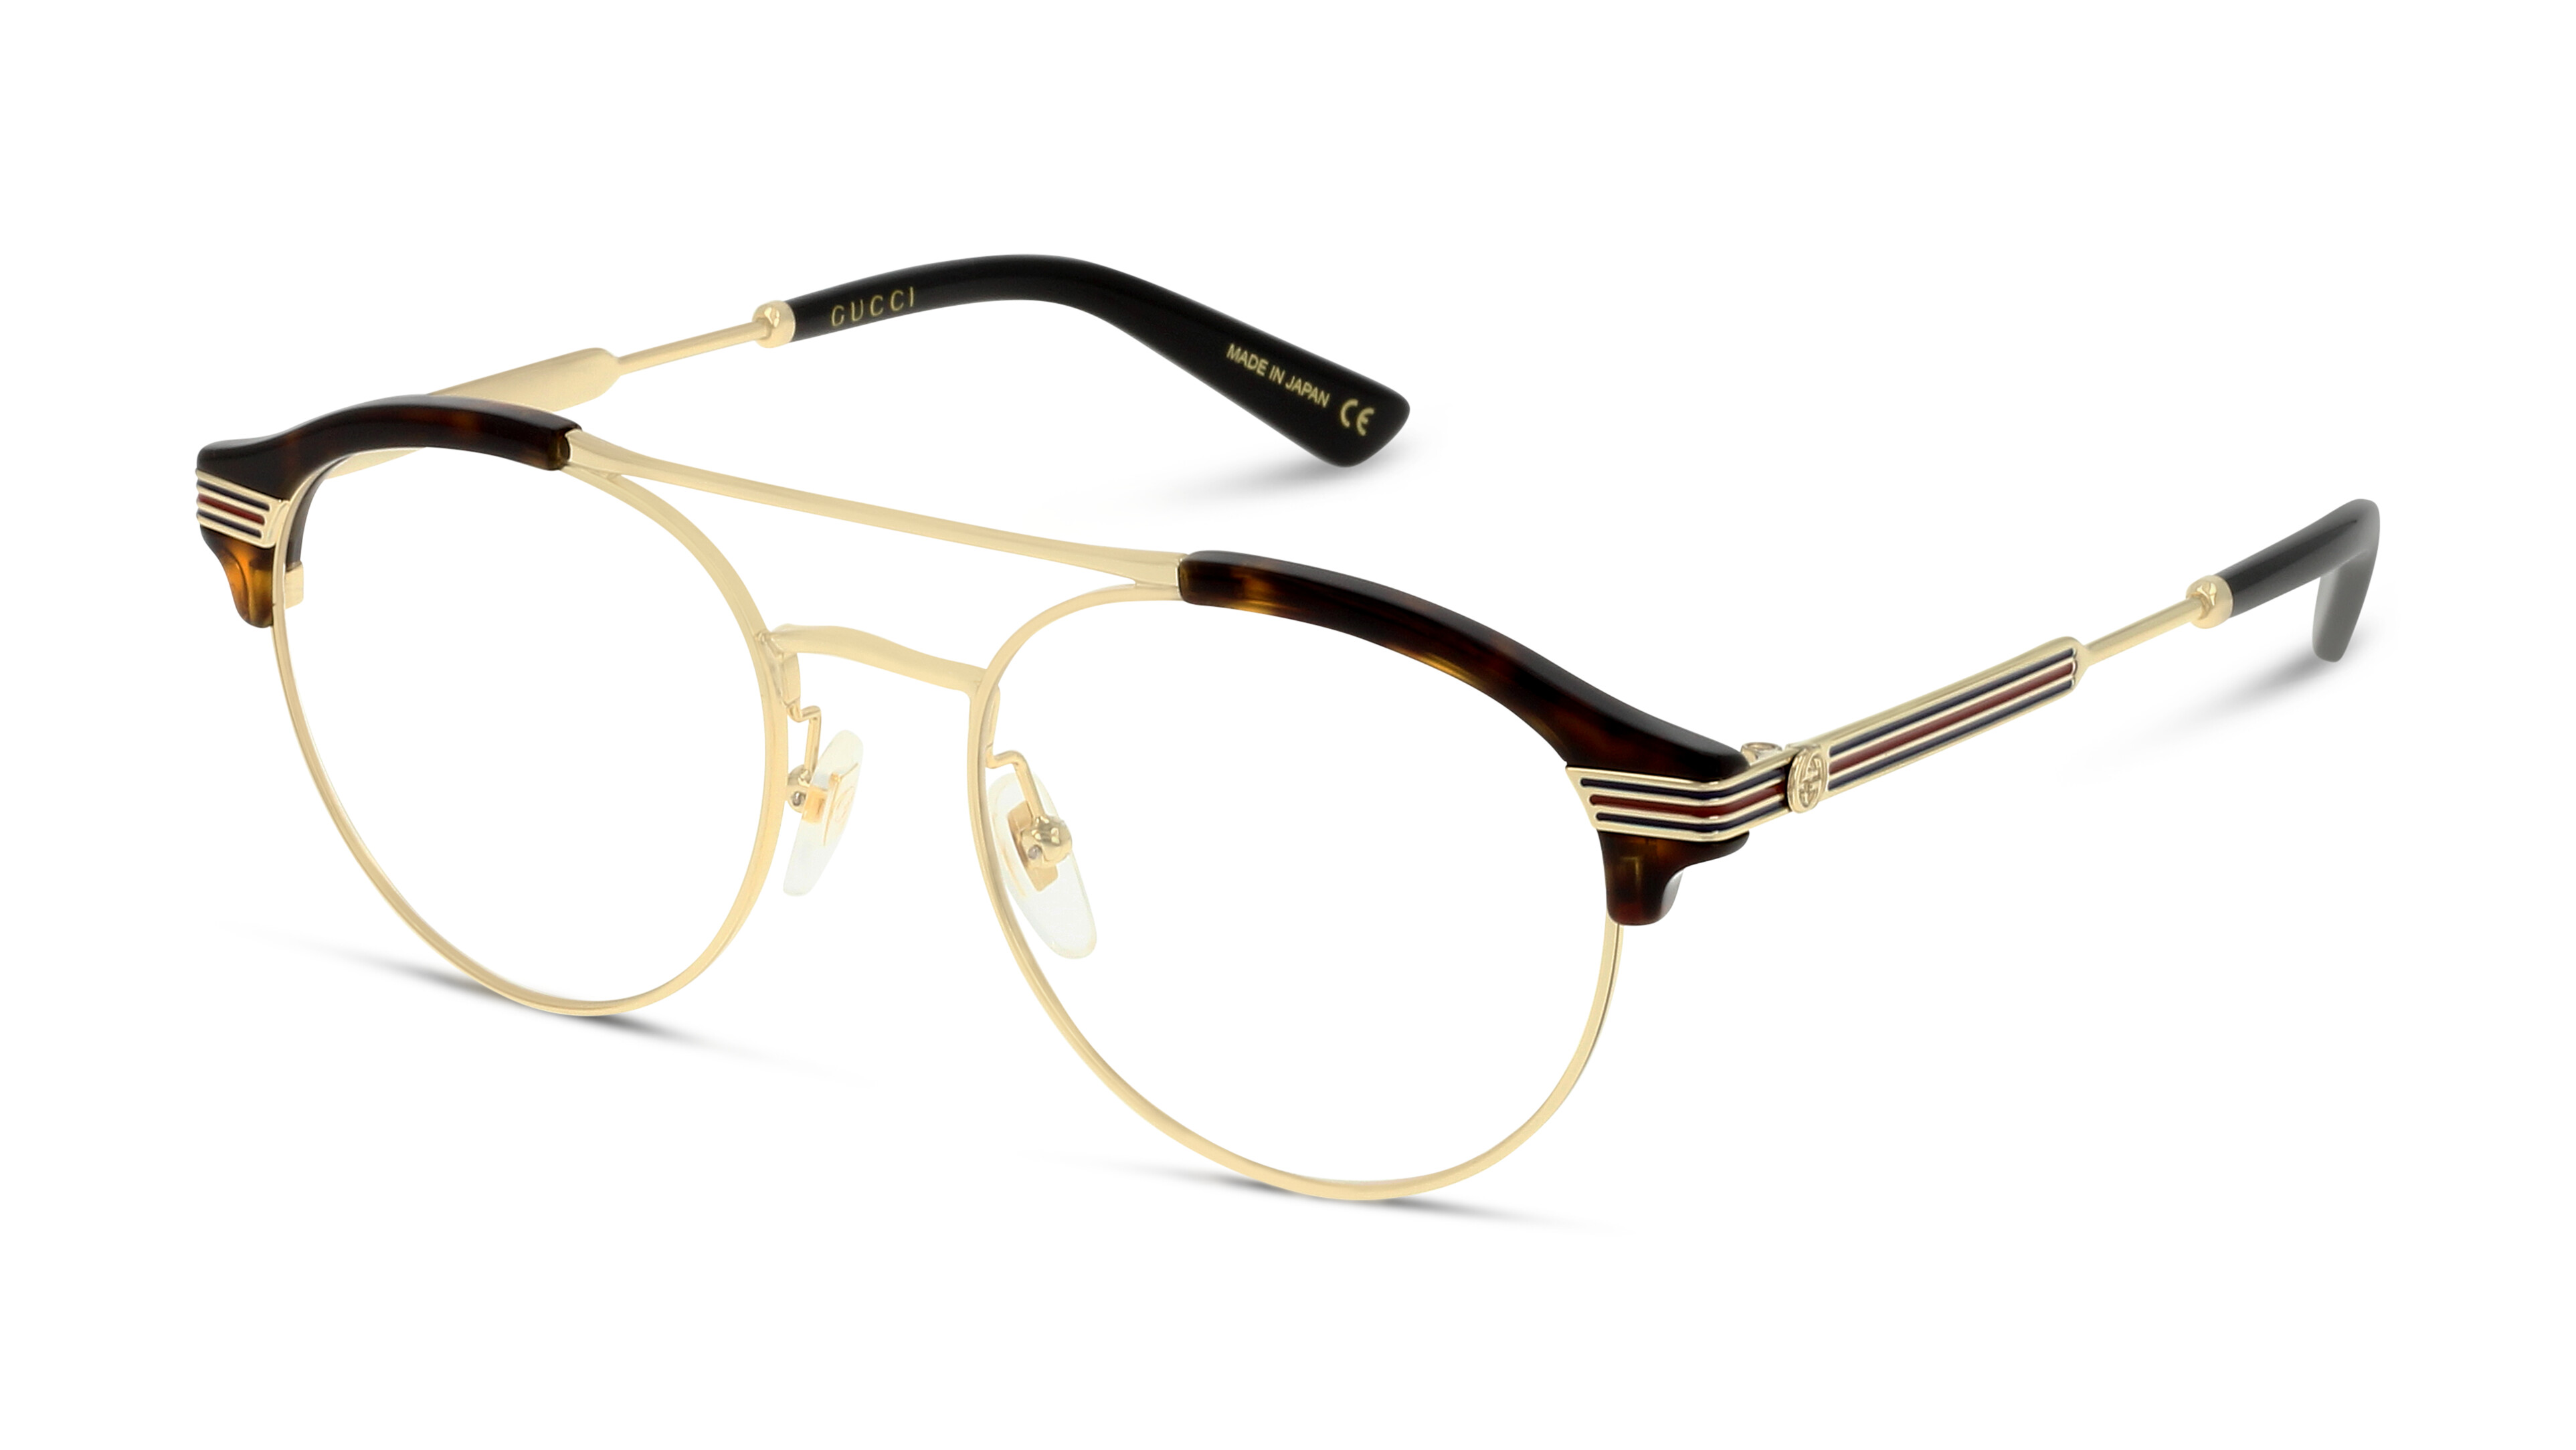 8056376156249-angle-brillenfassung-gucci-gg0289o-havana-gold-transparent